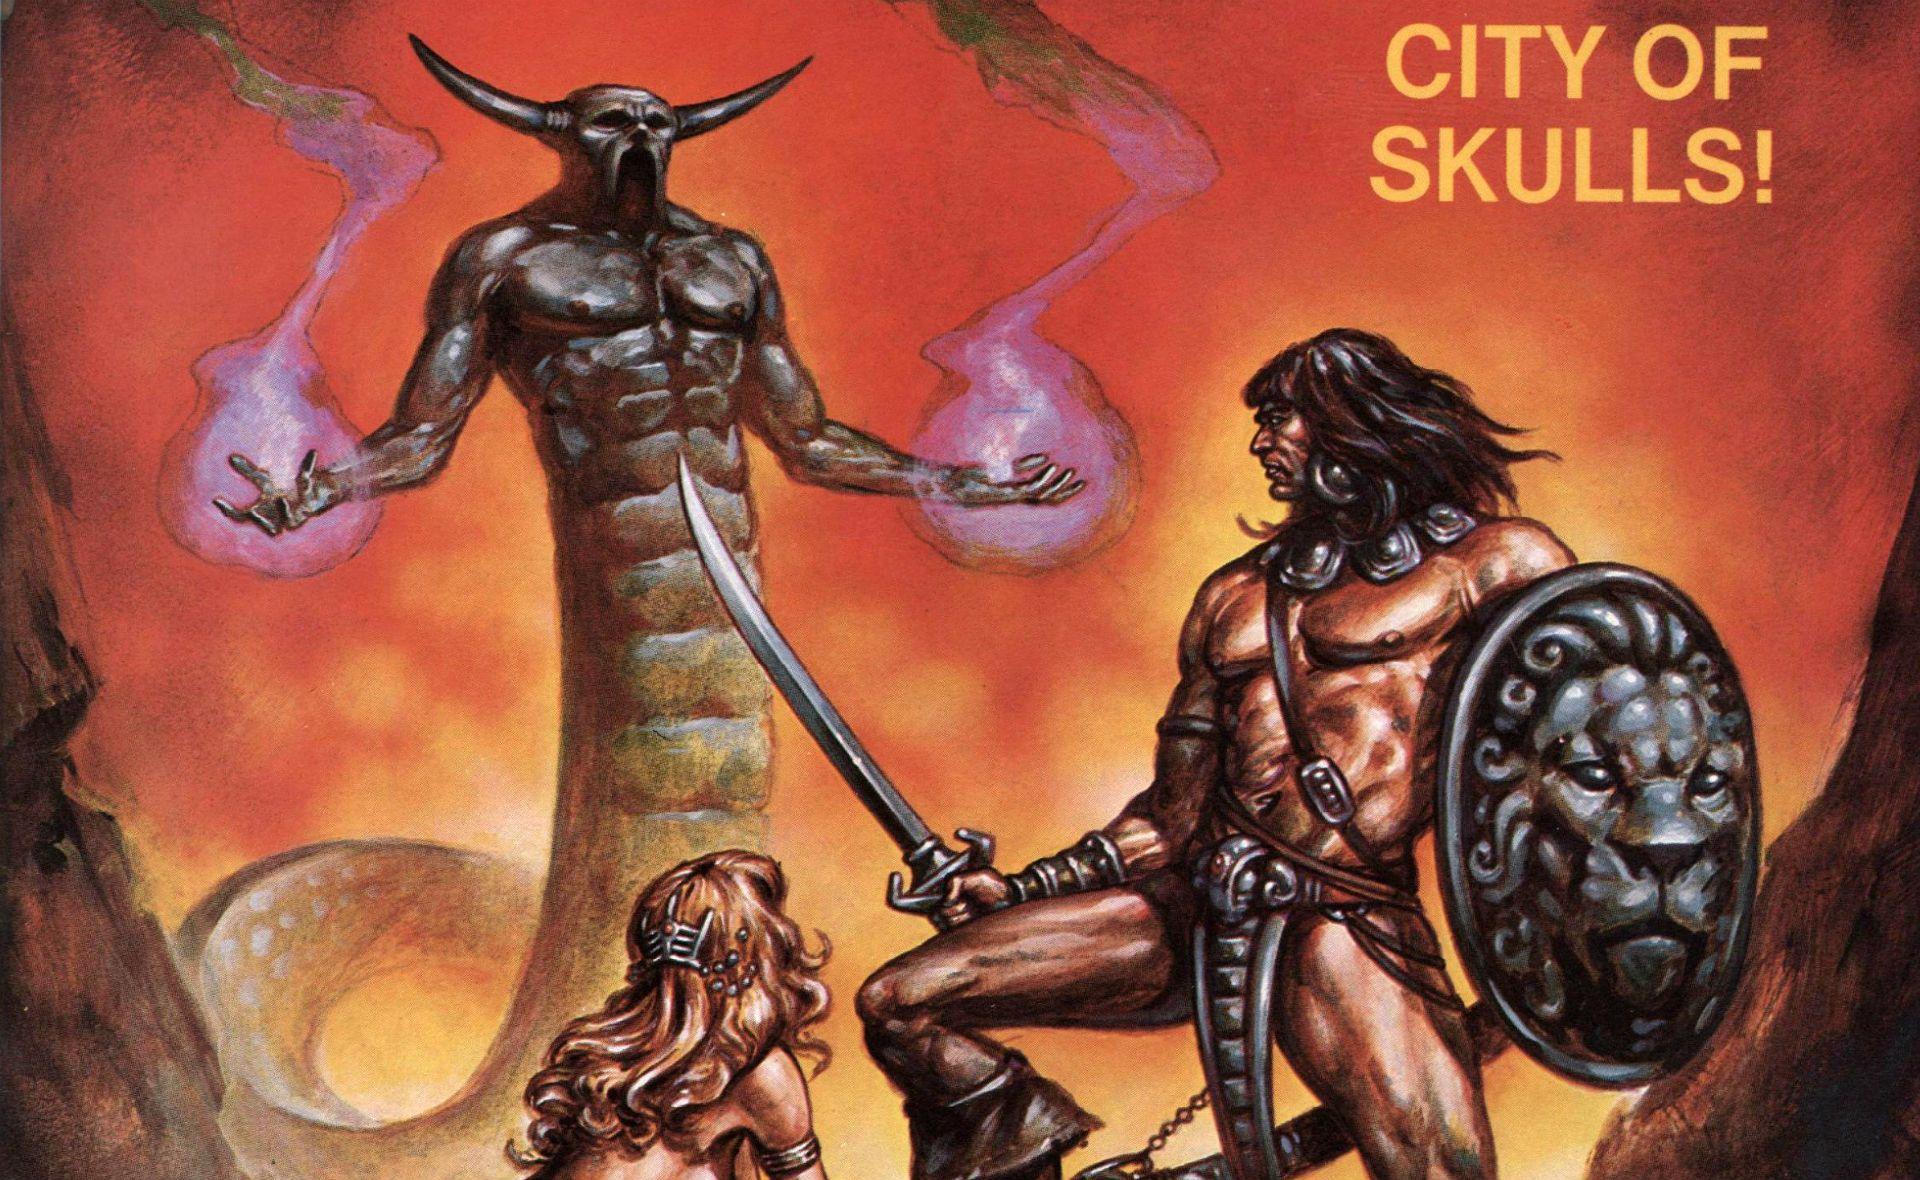 Conan The Barbarian Wallpapers Wallpapers Free Conan The